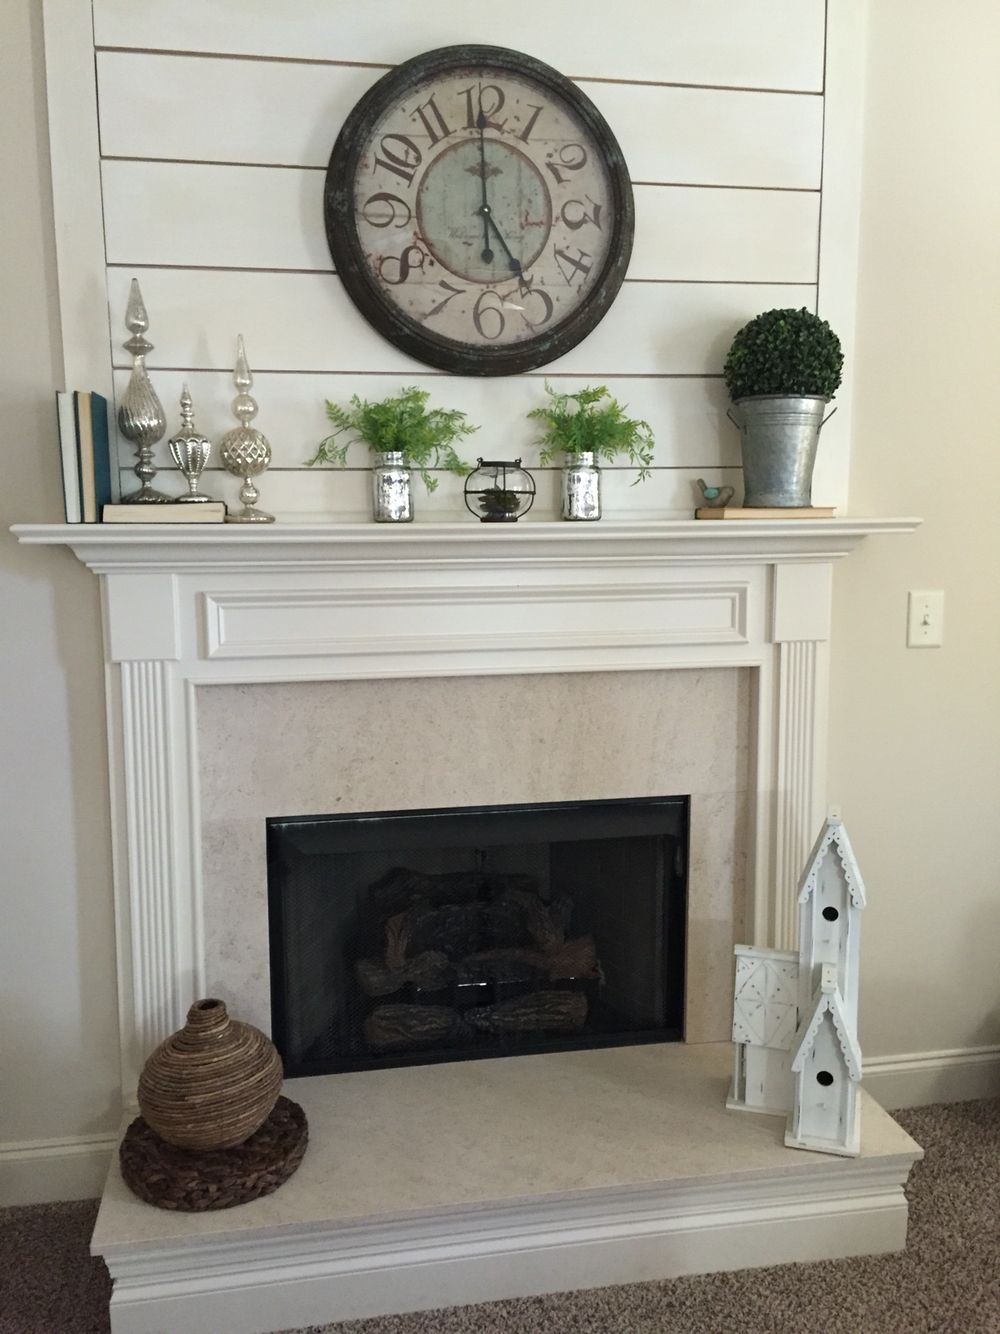 Diy shiplap fireplace. This gave a builder grade fireplace